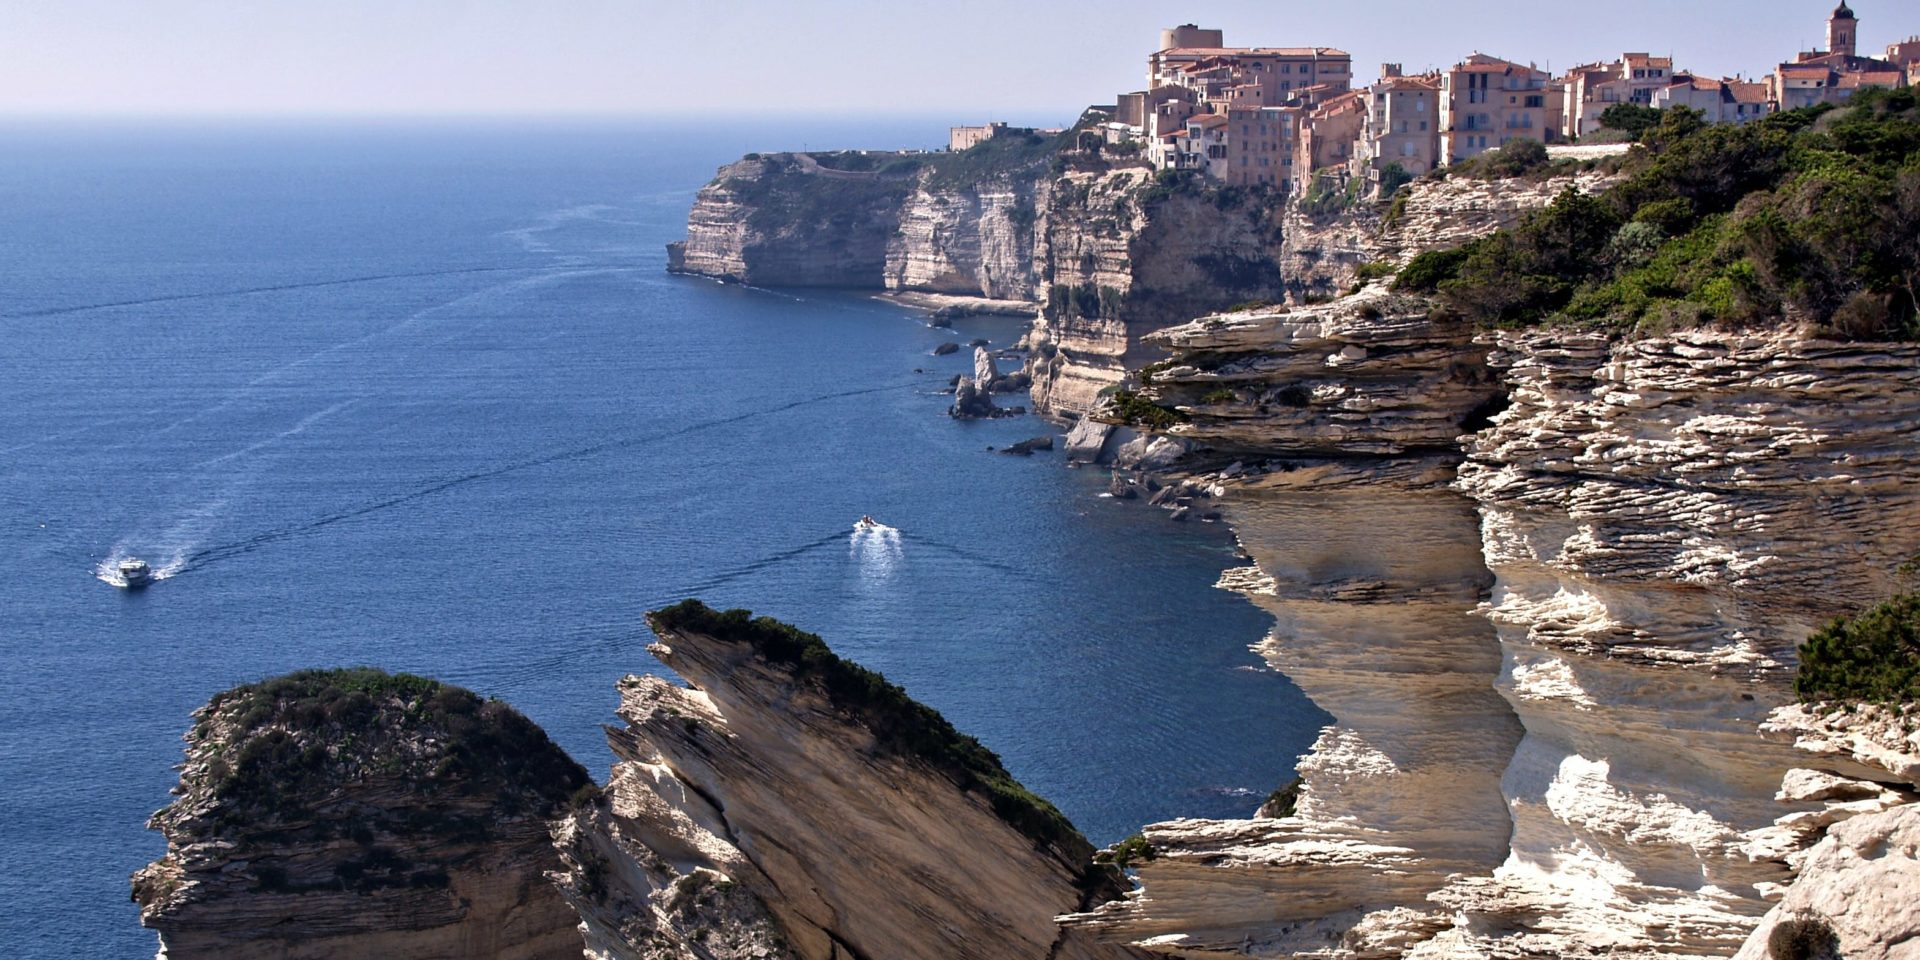 Best Western Hotel du Roy d'Aragon Bonifacio Corsica Frankrijk falaises kliffen bovenstad zee boten